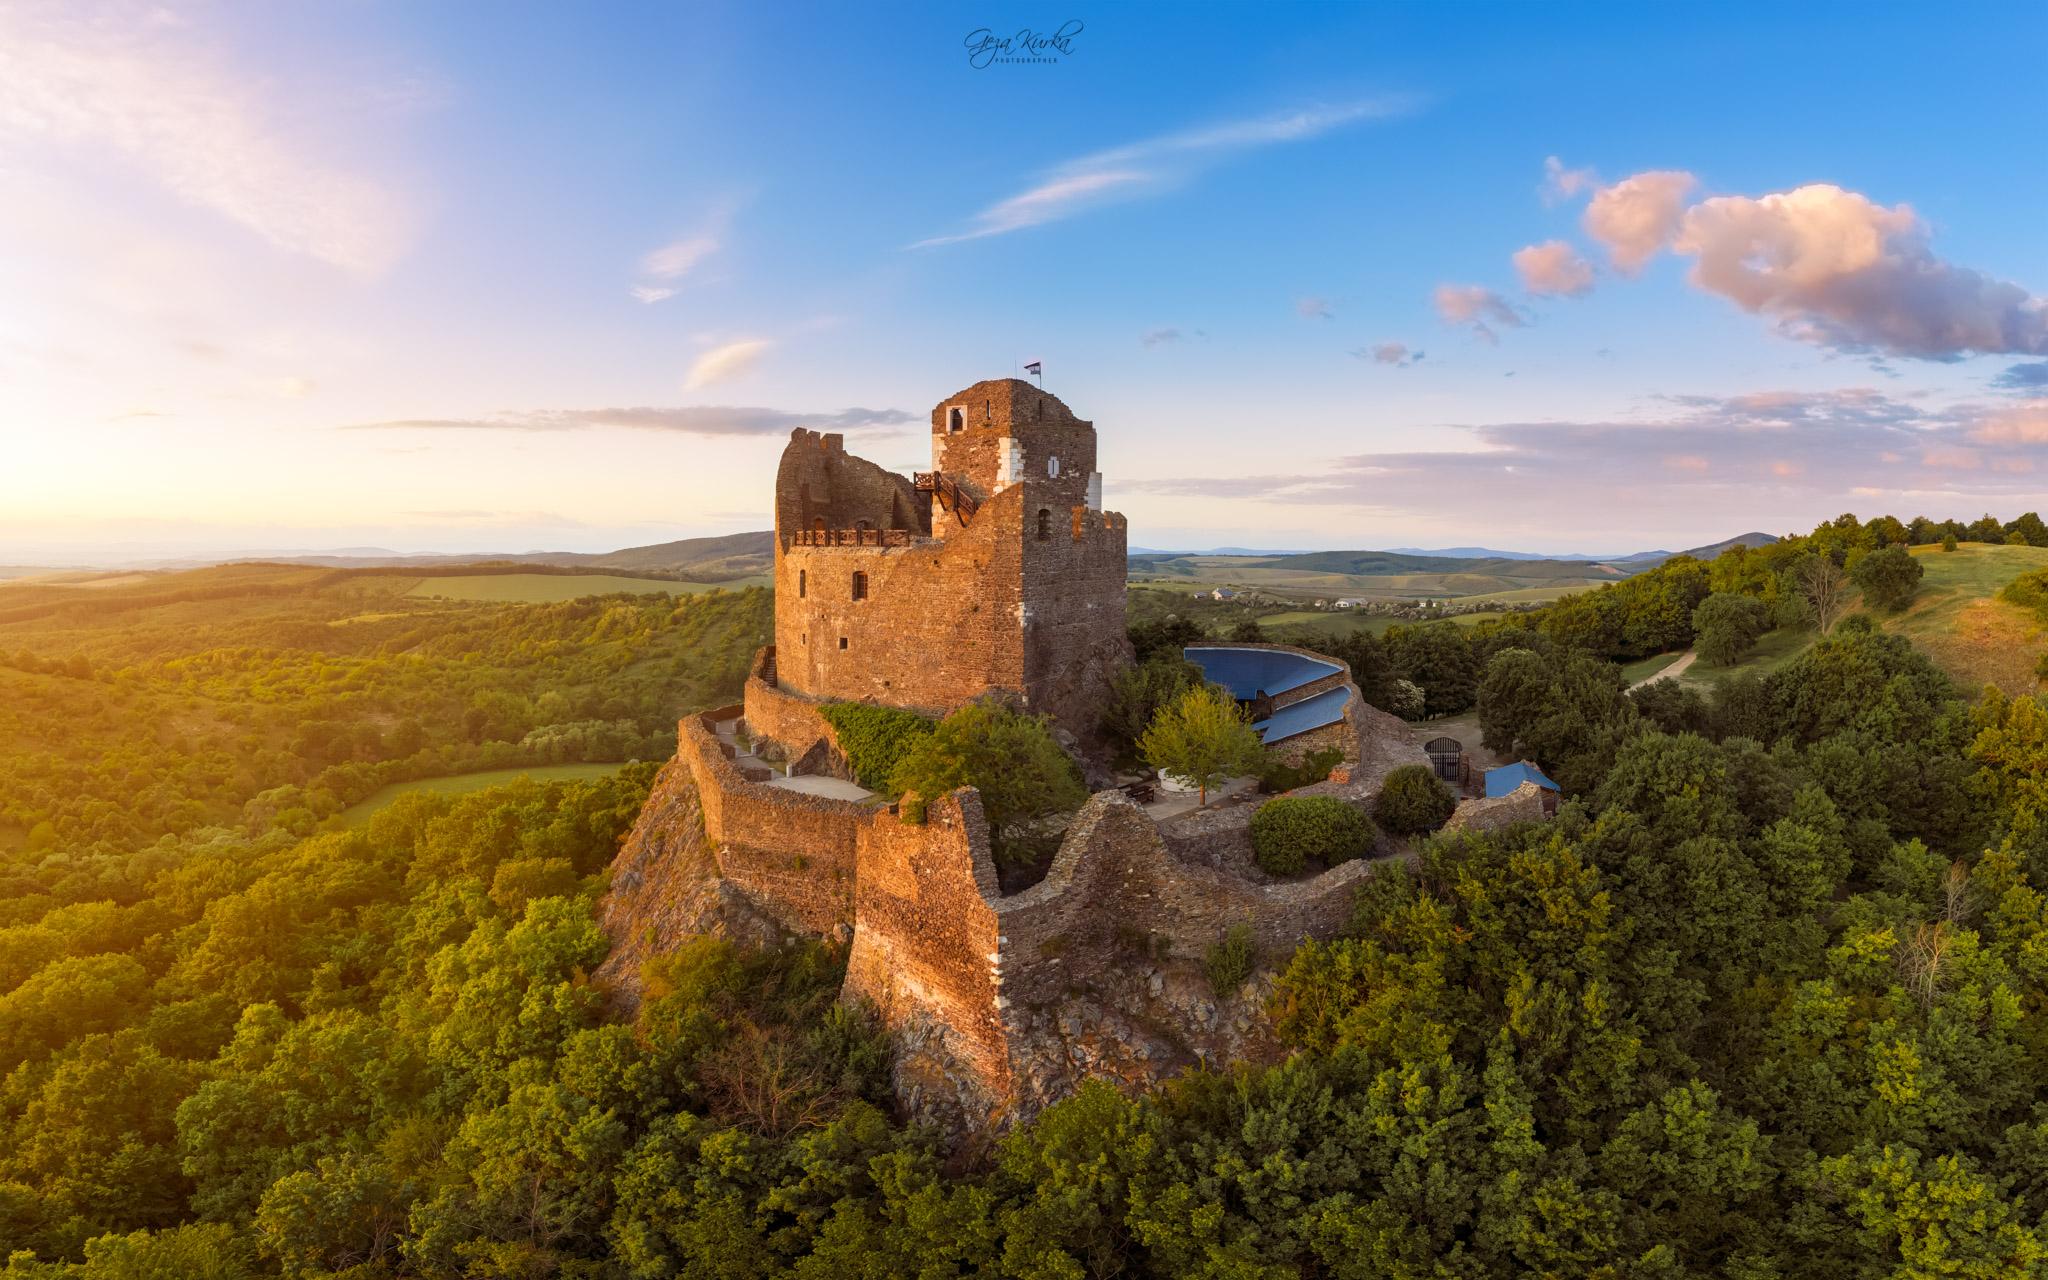 Castle ruins of Holloko, Hungary., Hungary